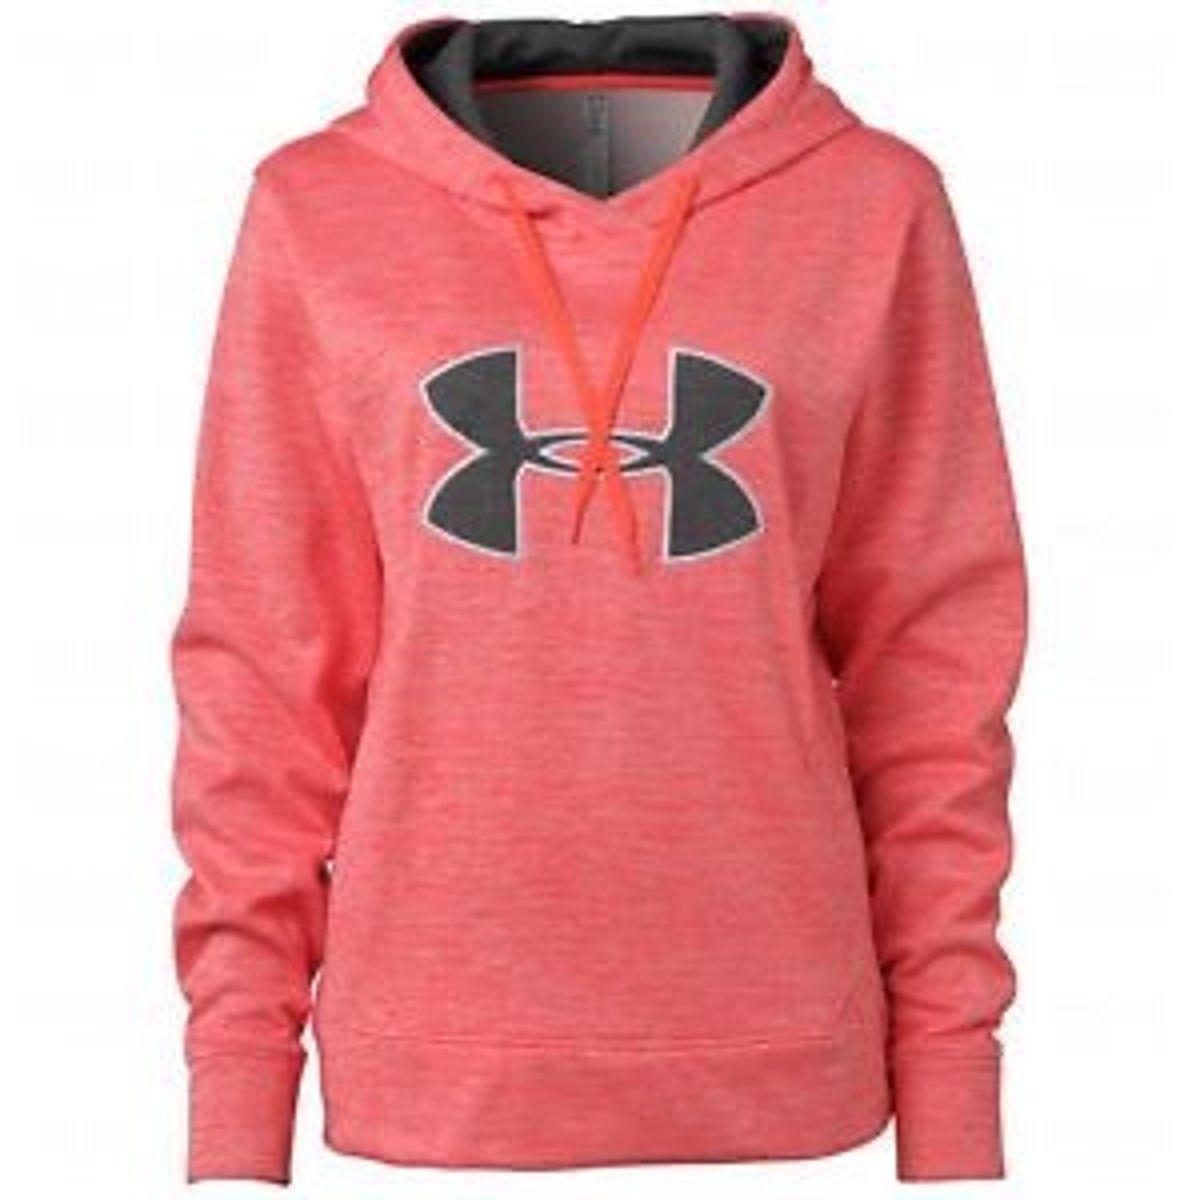 Neon Pink Under Armour Hoodie Under Armour Hoodie Under Armour Women Under Armour Sweatshirts [ 1200 x 1200 Pixel ]